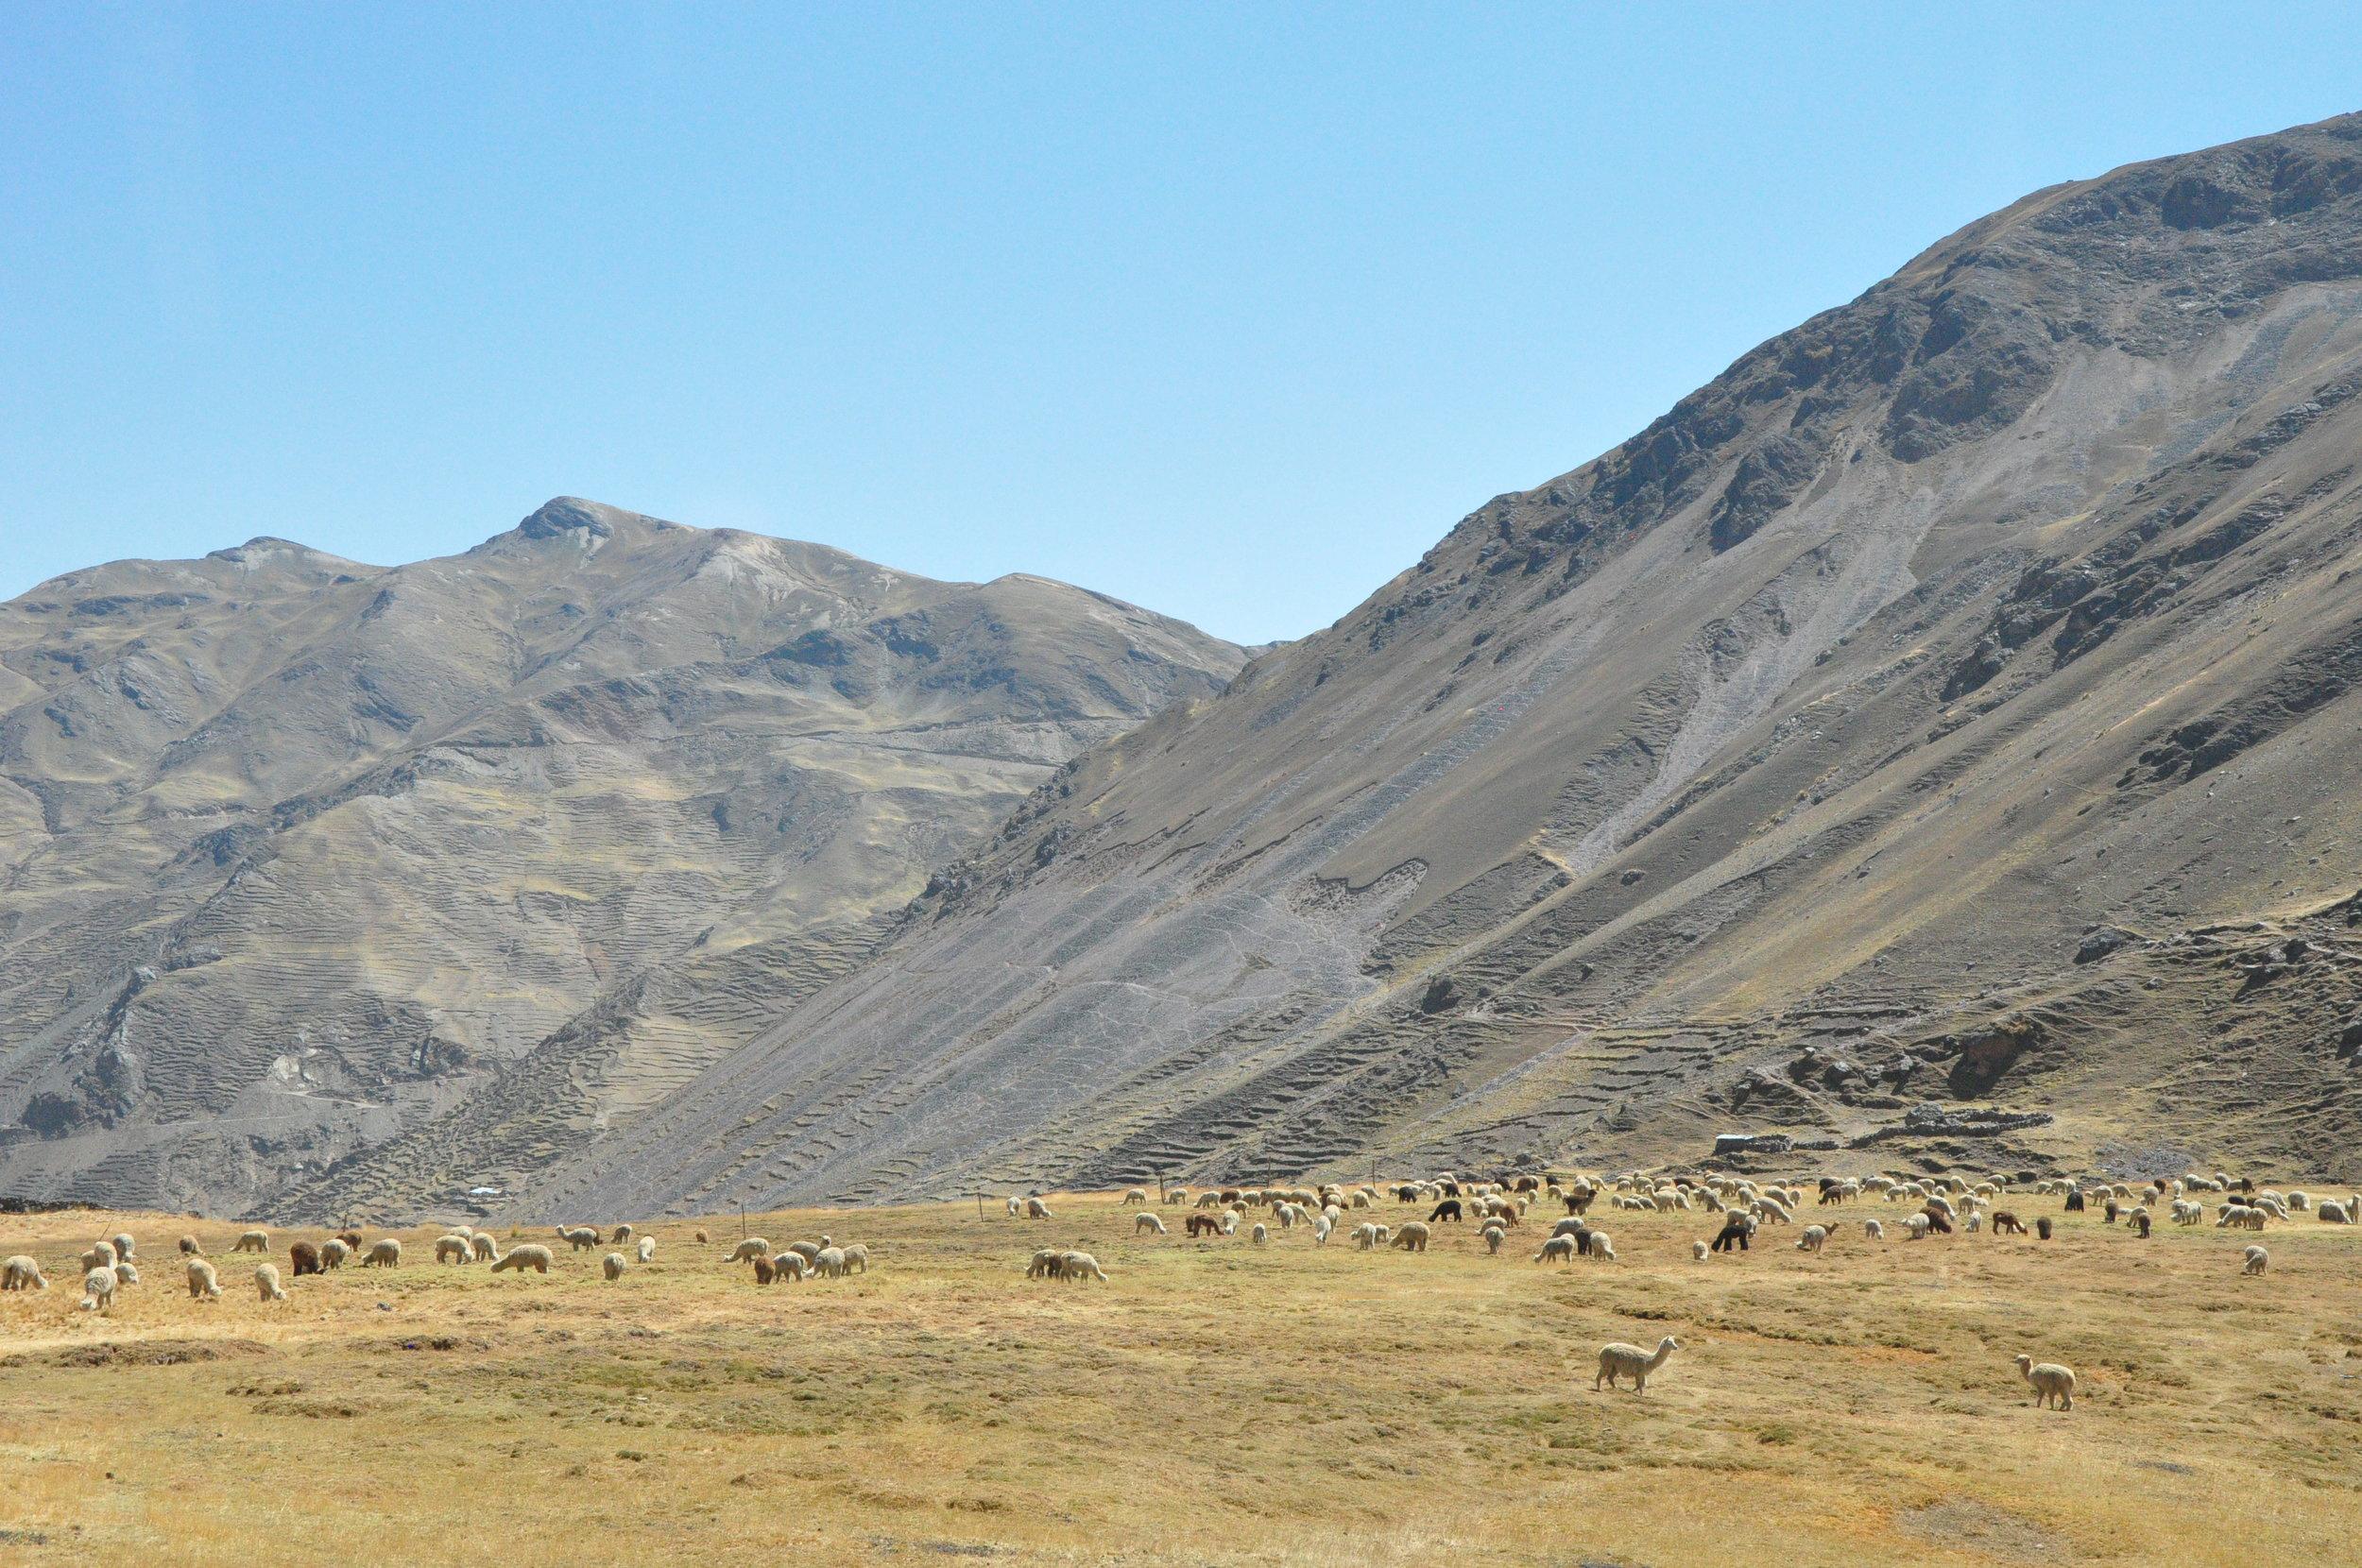 Alpaca herd.  Alpacas live at higher altitudes than llamas.